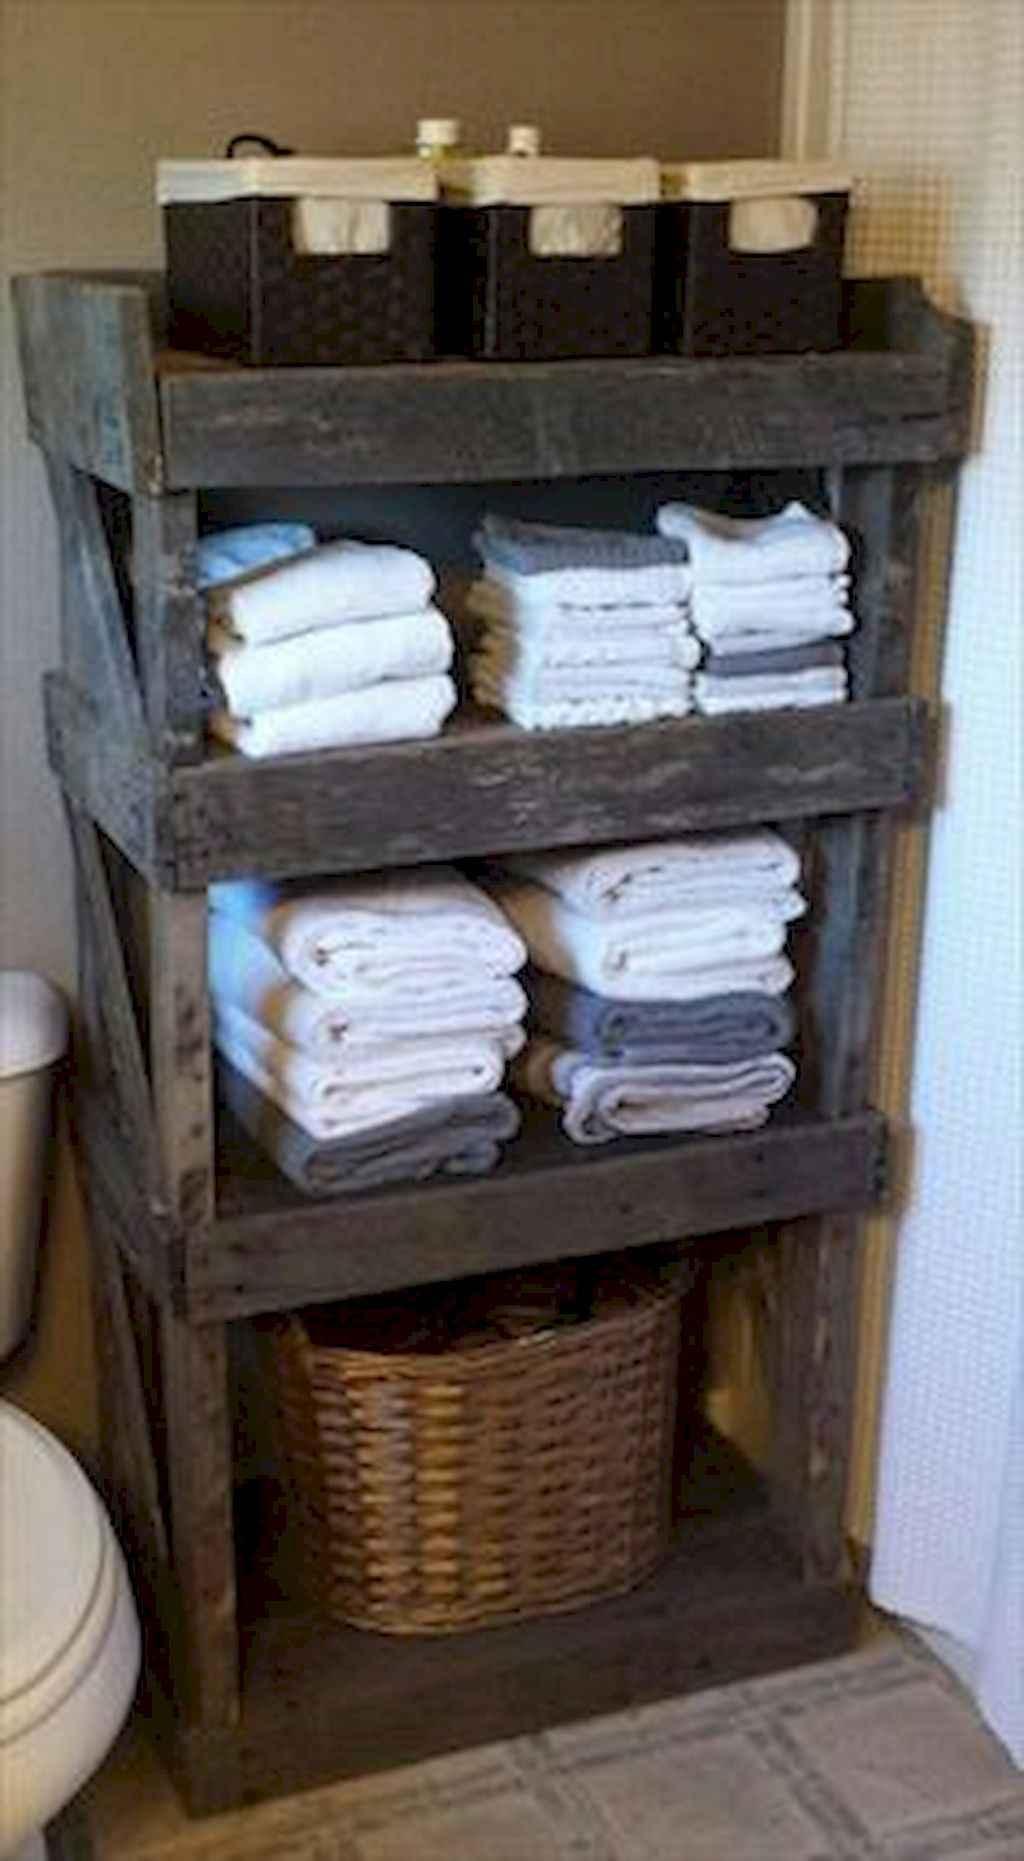 Cool bathroom storage shelves organization ideas (60)